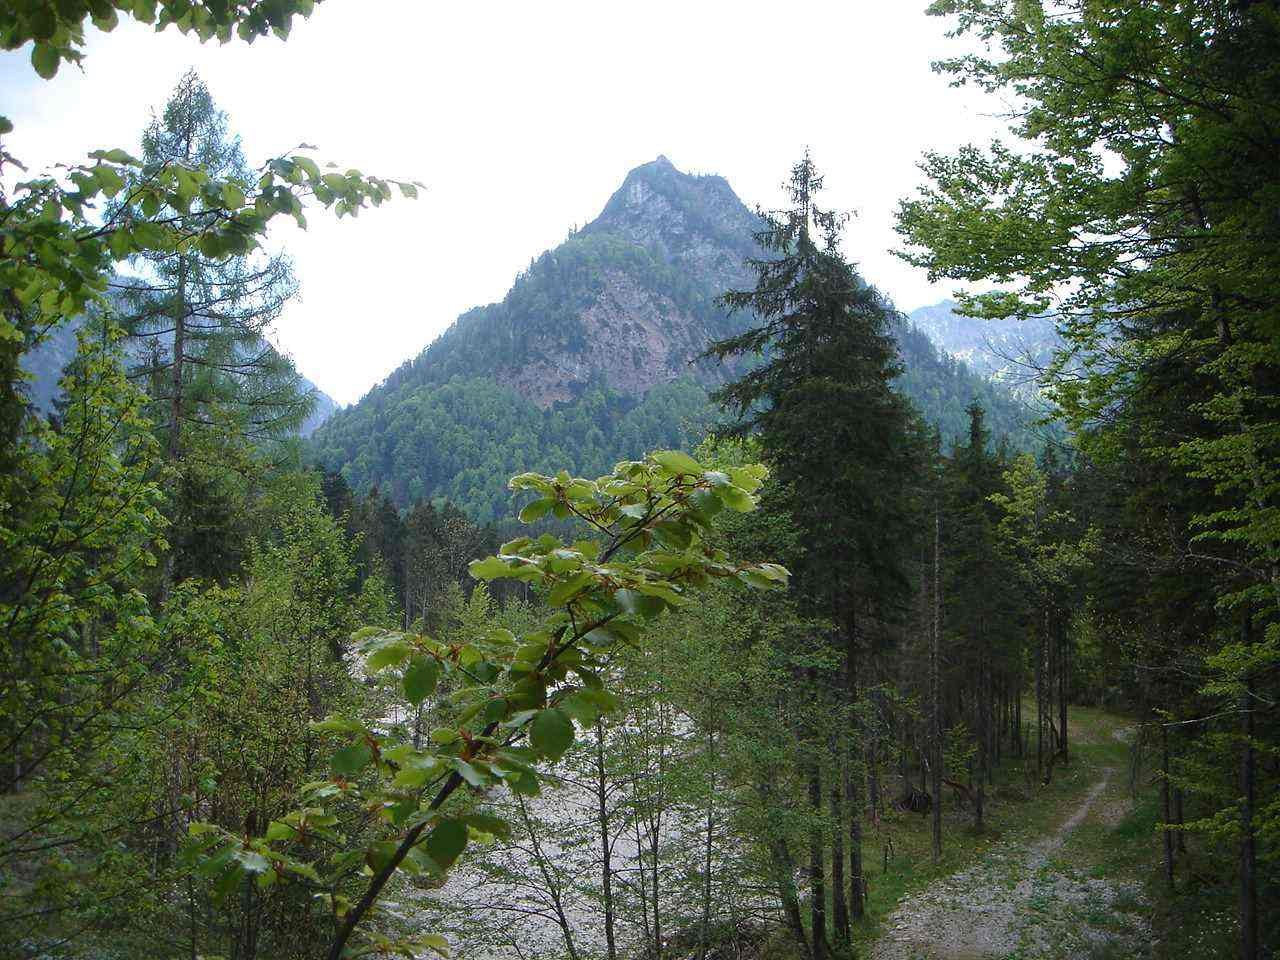 Foto: Manfred Karl / Mountainbiketour / Saurüsselkopf (1270m) / Saurüsselkopf / 19.06.2007 06:13:27